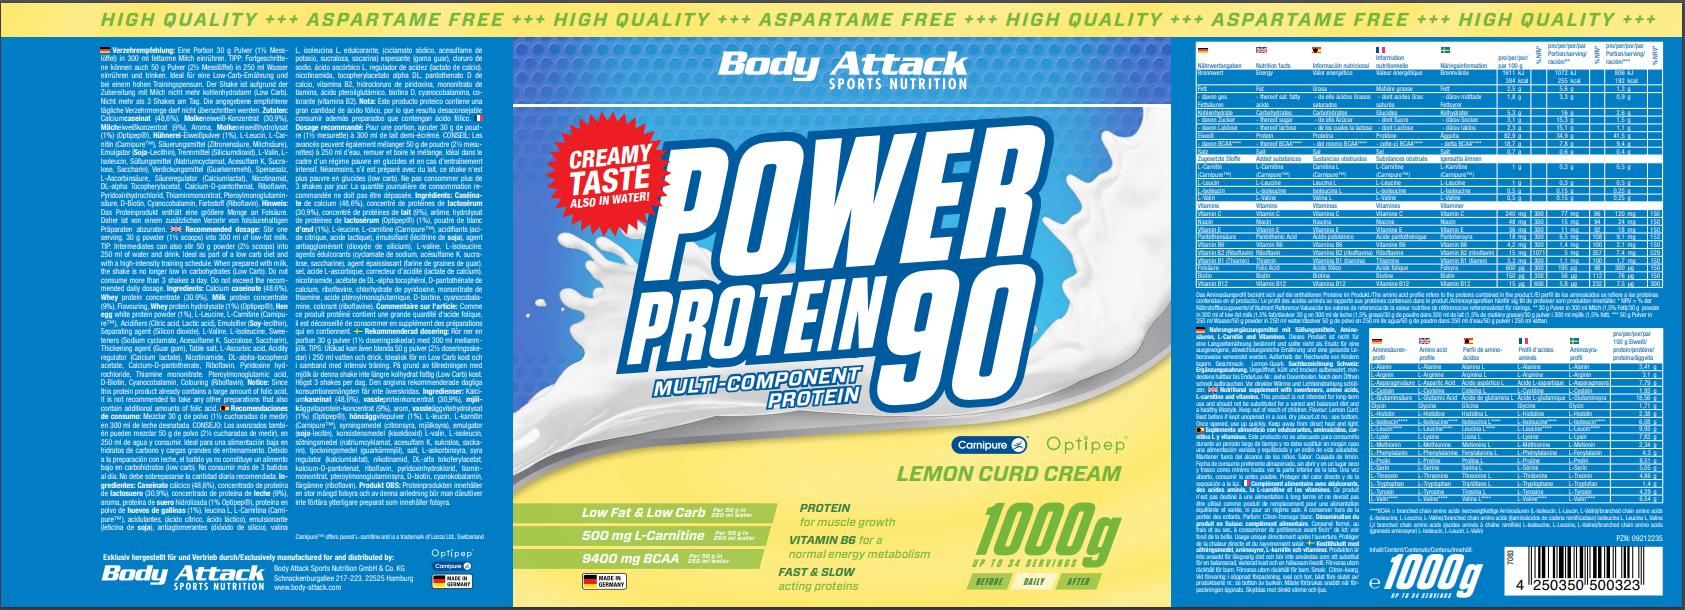 Power Proti 90 Lemon